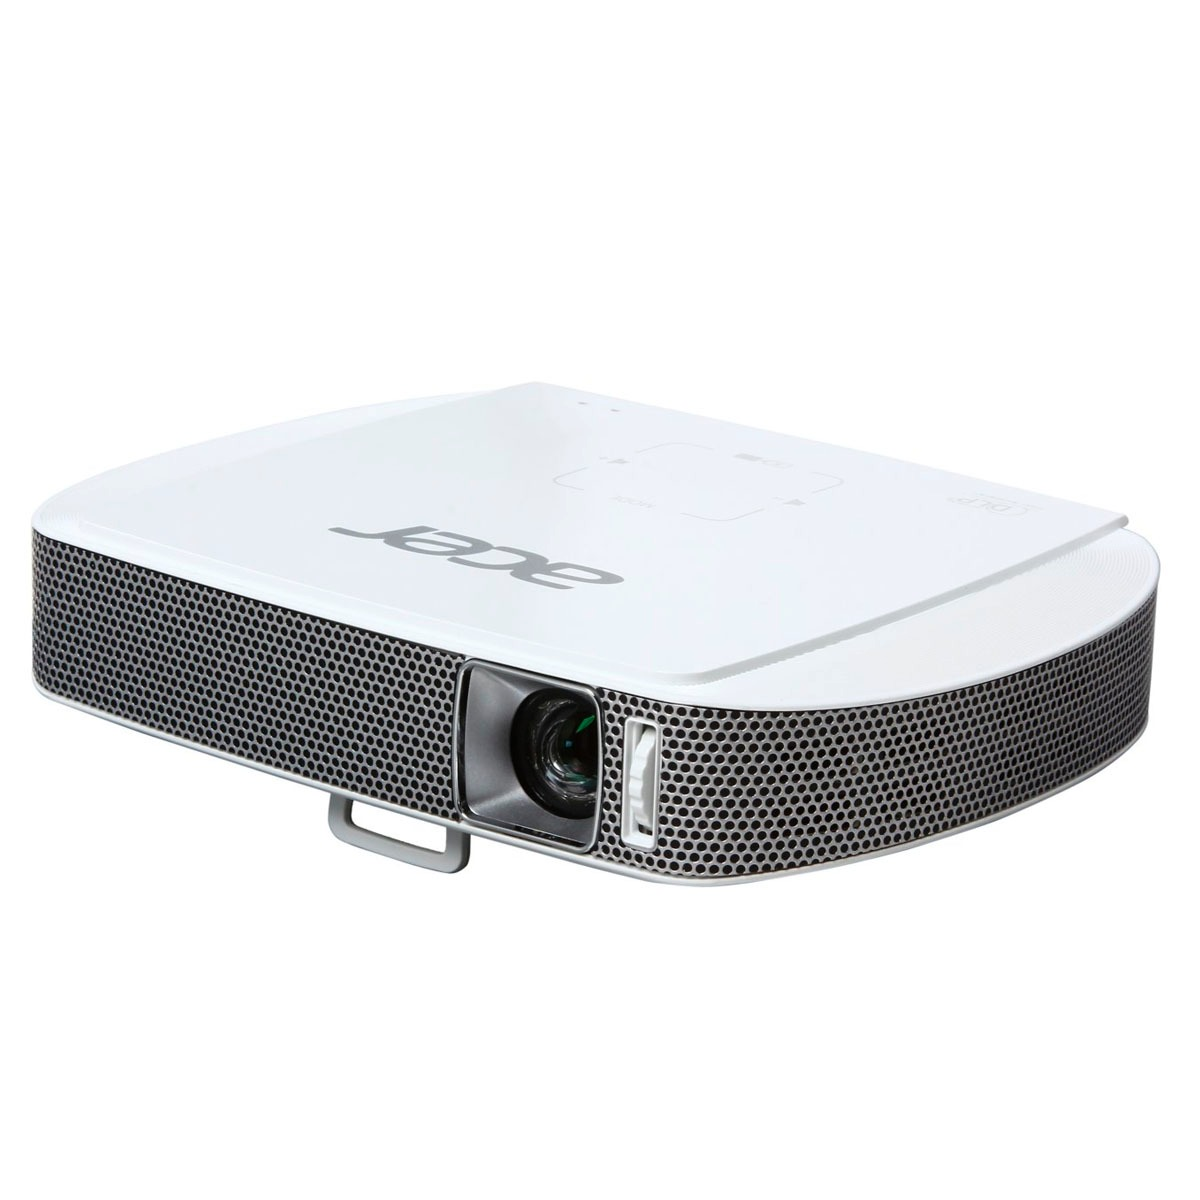 MINI PROYECTOR ACER C205 200 LMS DLP hdmi usb audio  bateria recargarble